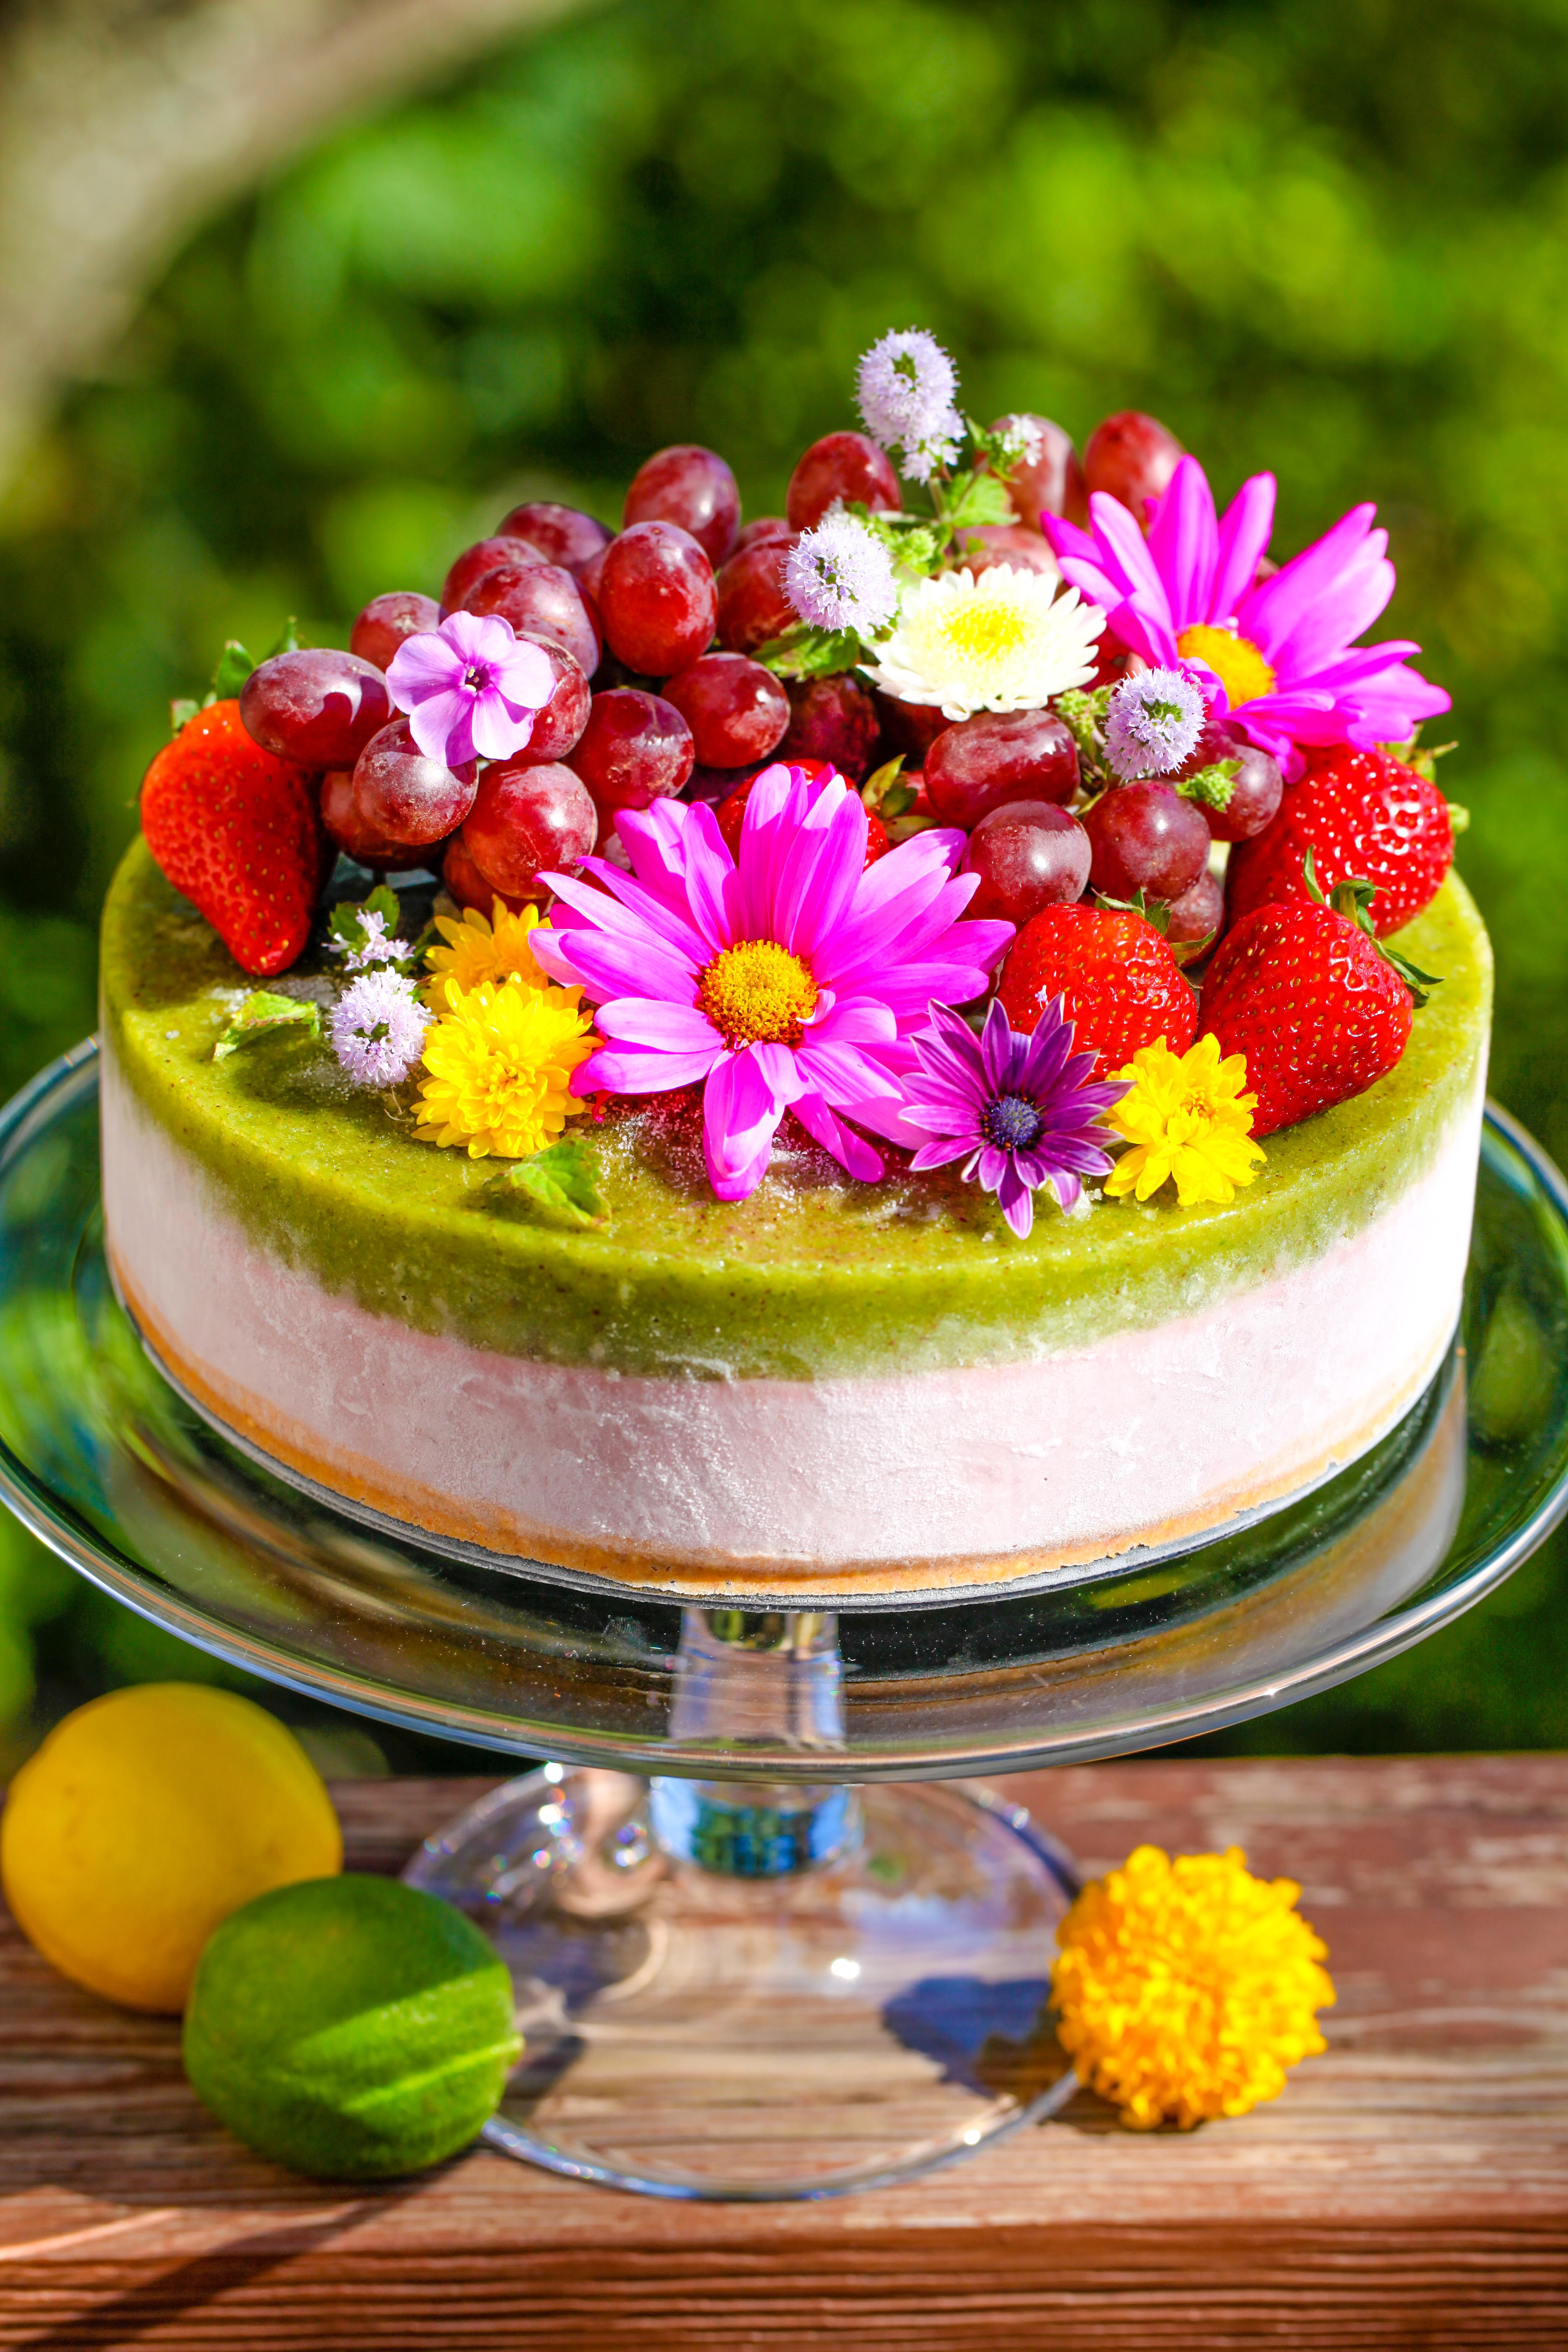 Olenko's Welcome to Paradise Cake